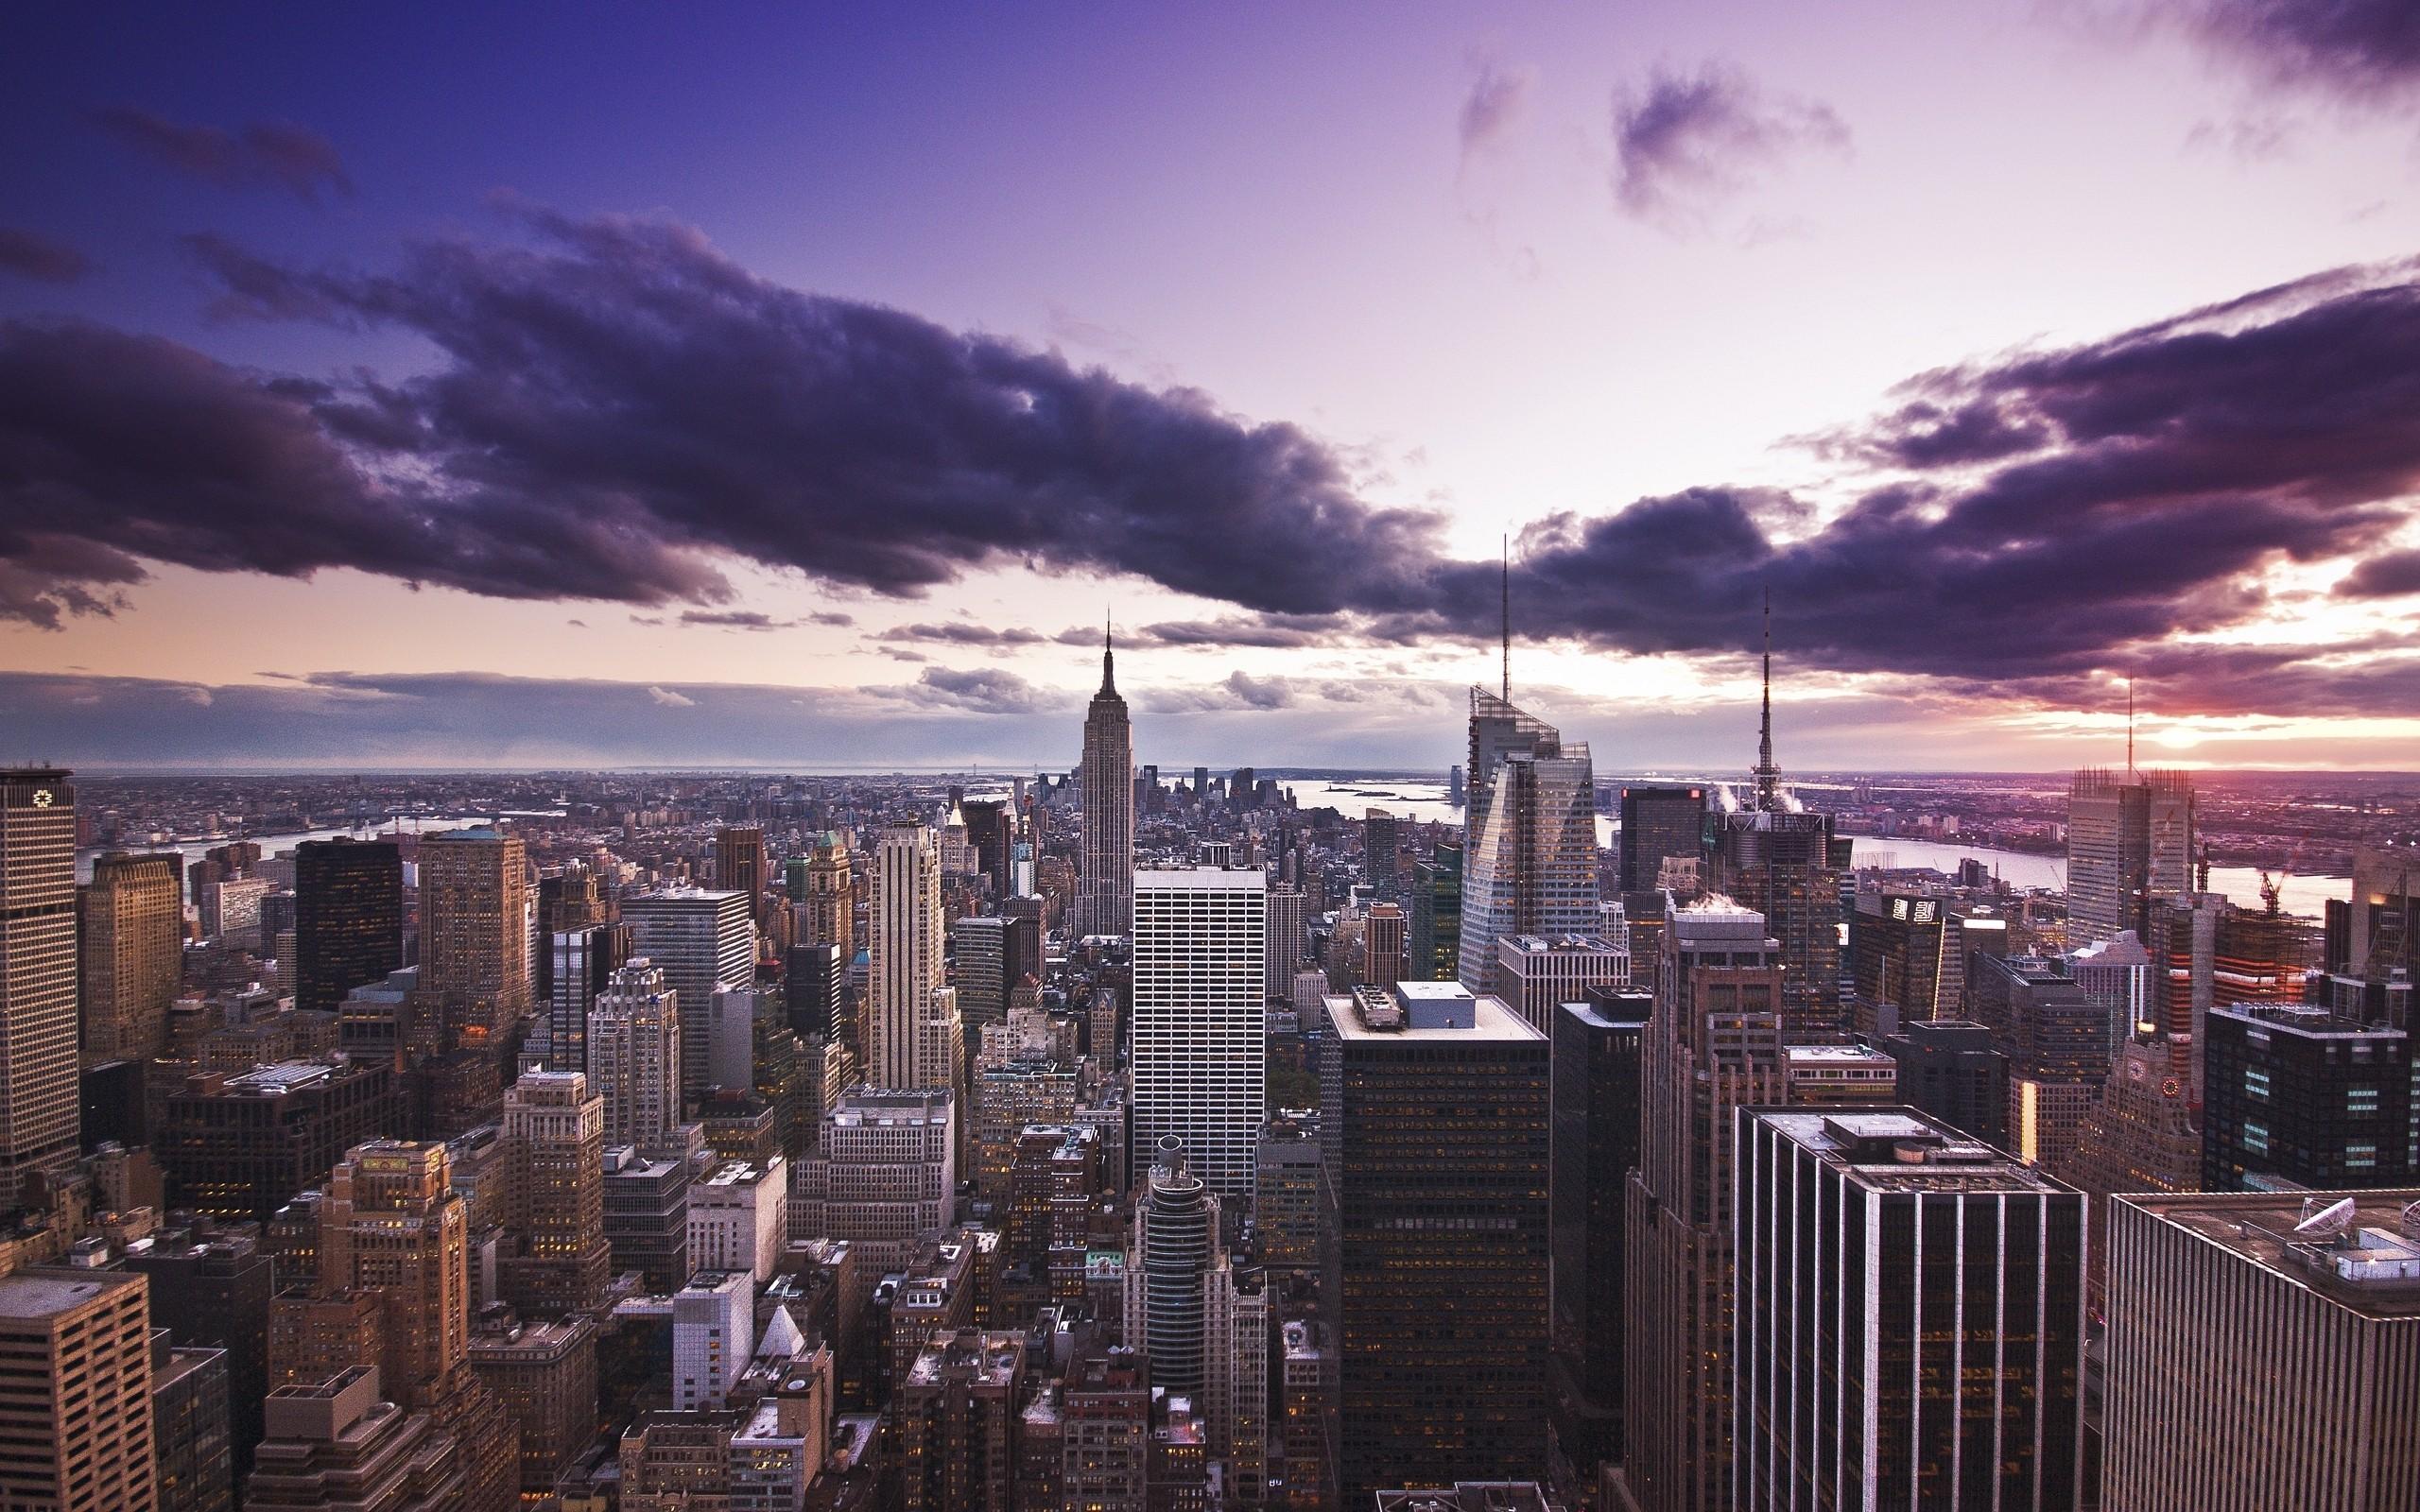 desktop wallpaper tumblr,metropolitan area,city,cityscape,sky,metropolis